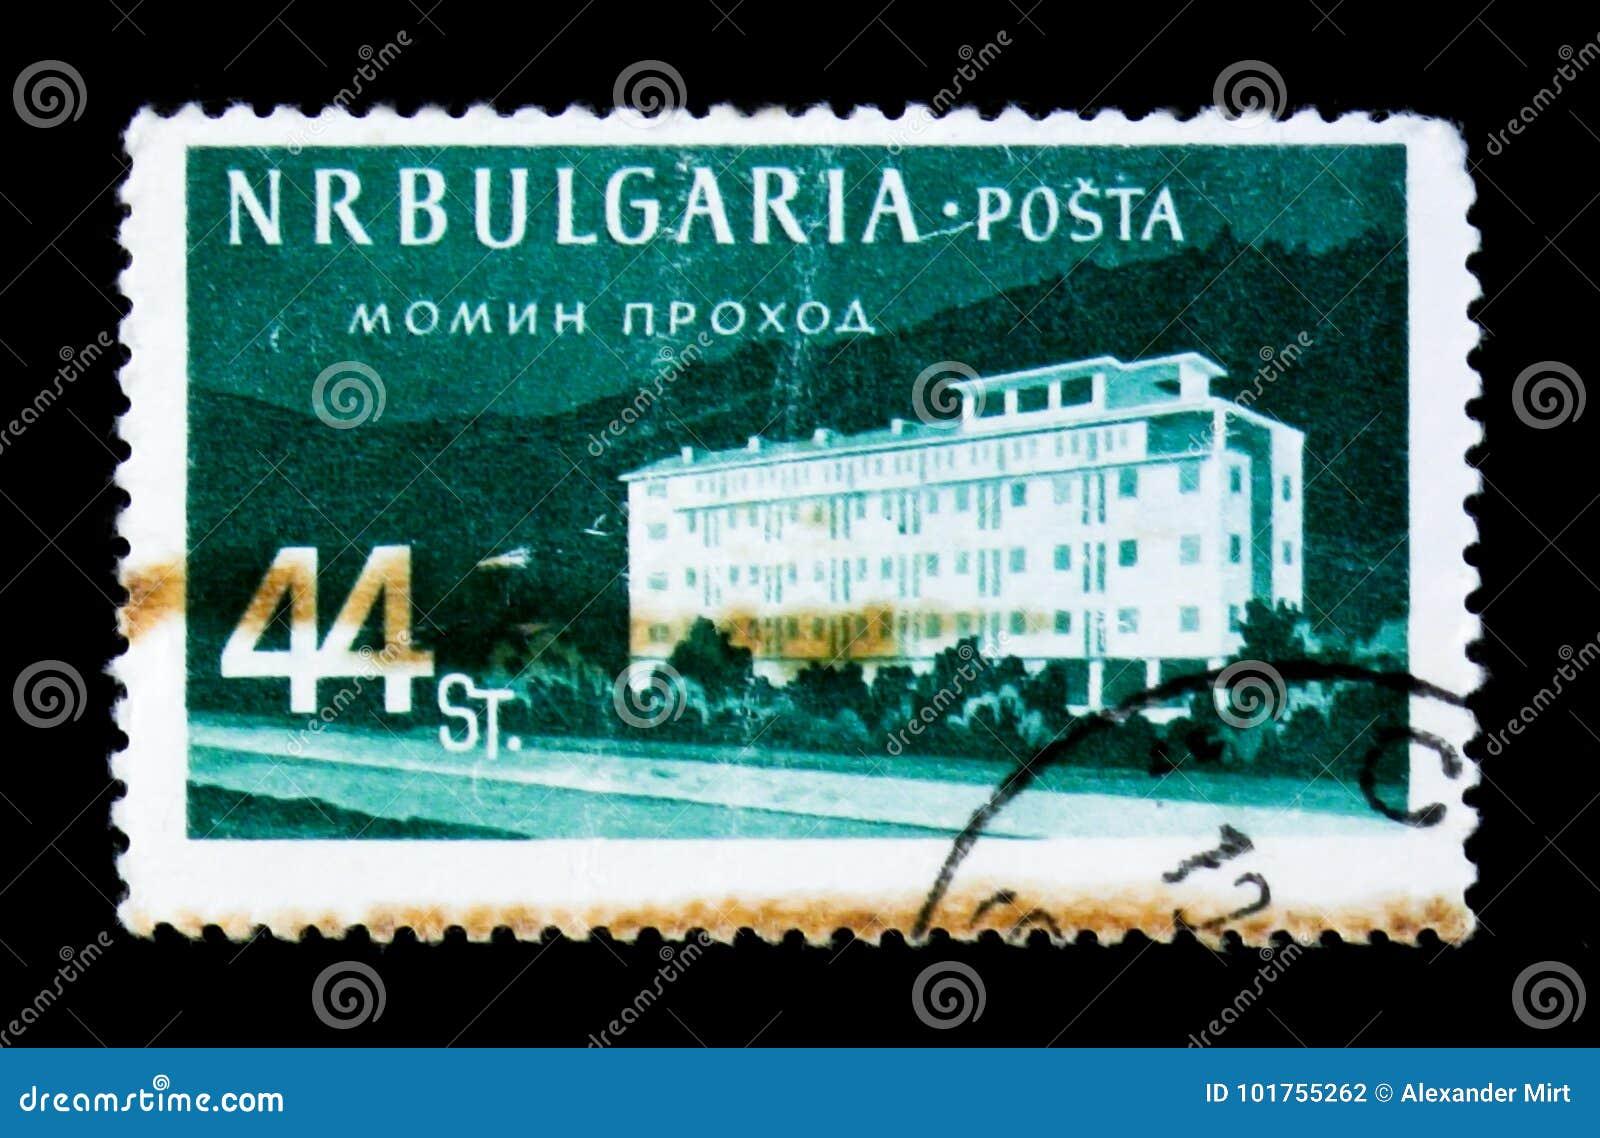 Monn Prochod Surchargé, Bulgaarse Recreatiefaciliteiten en Plaatsen I, circa 1958